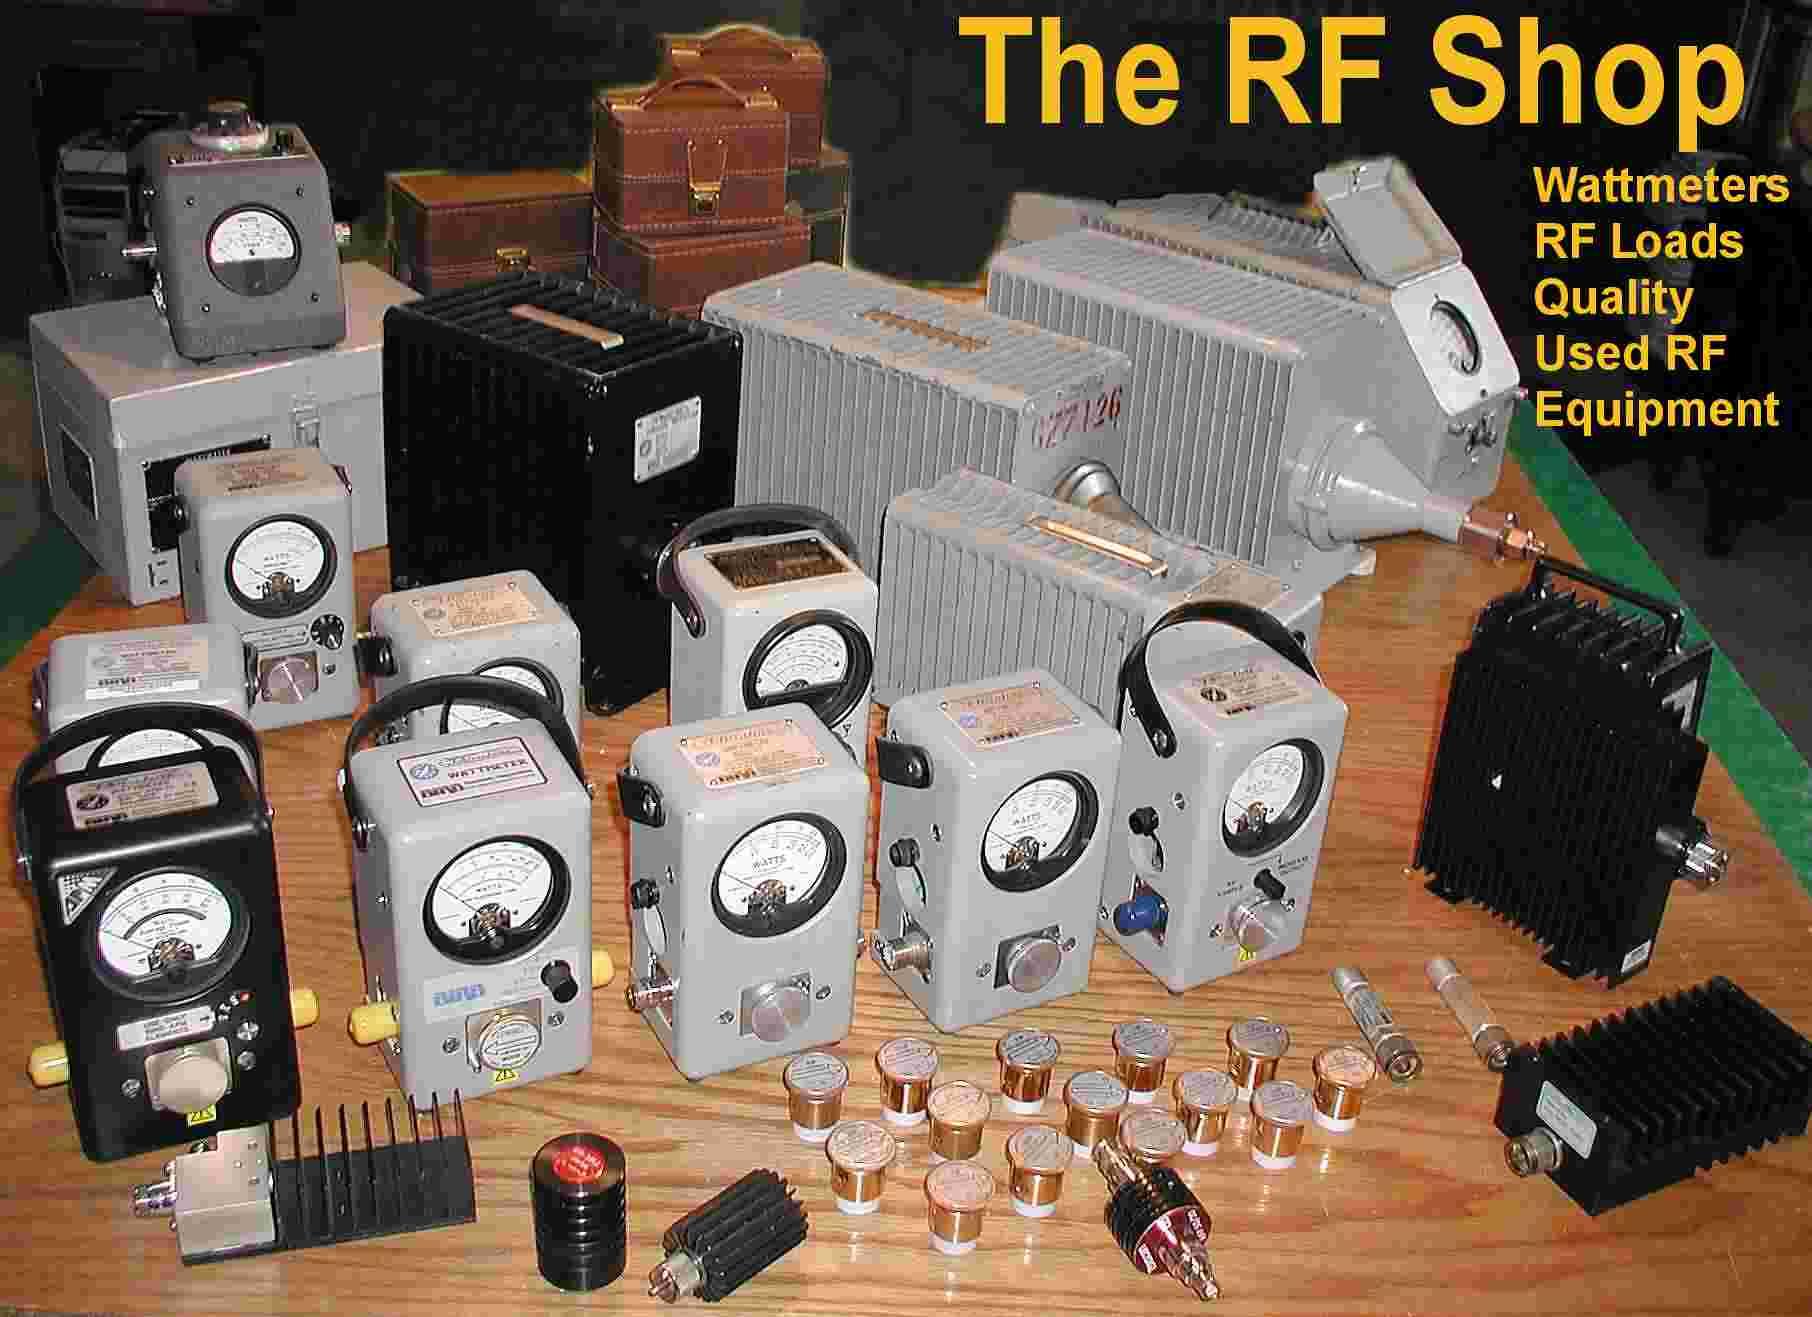 The RF Shop Wattmeter Display